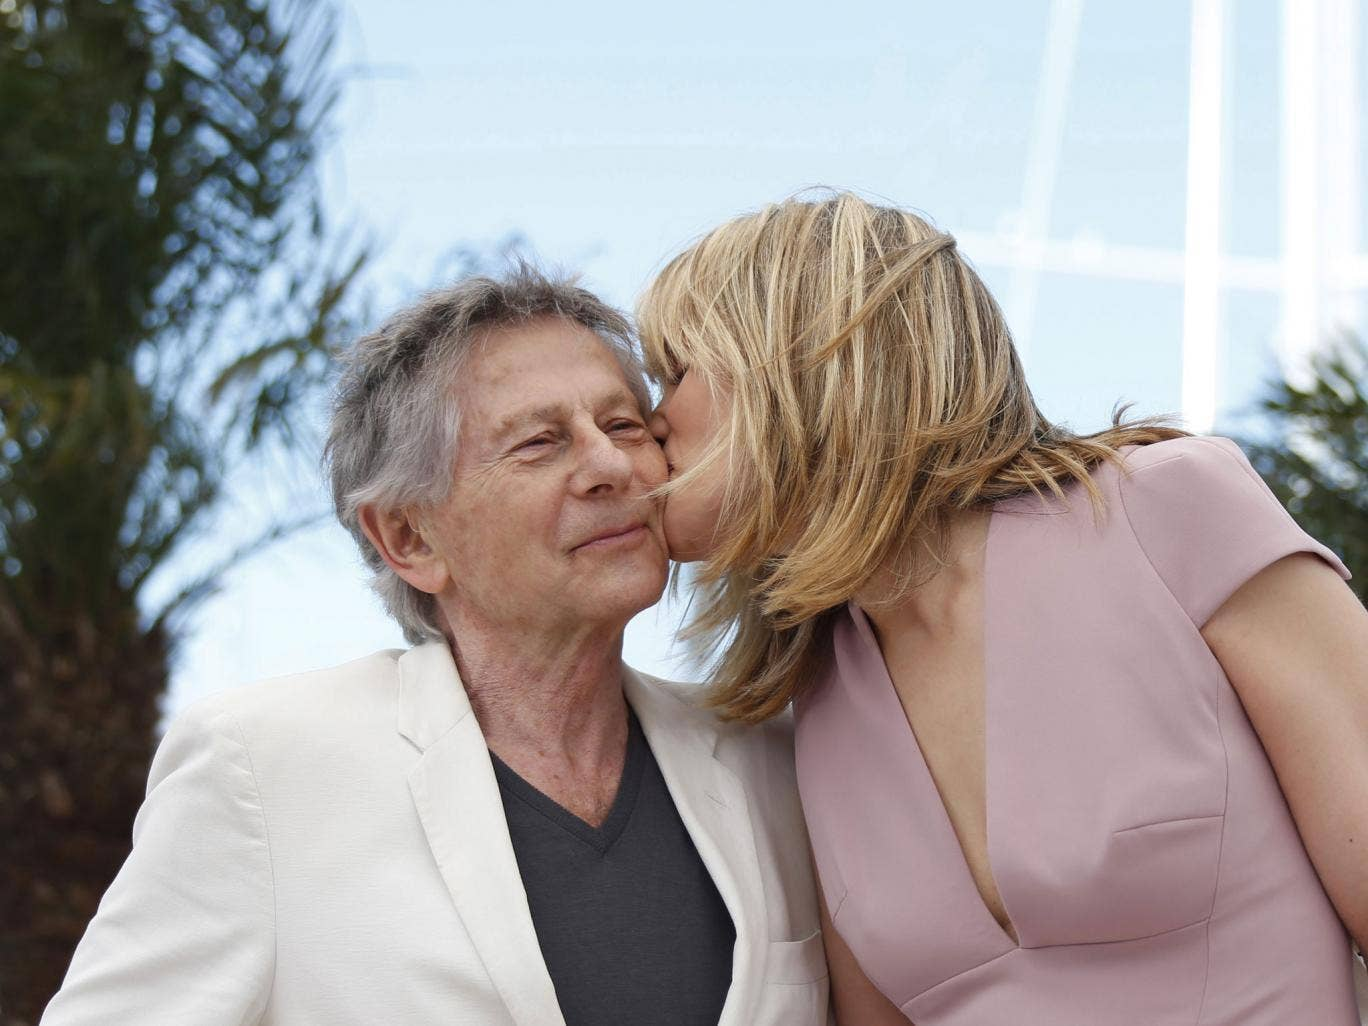 Emmanuelle Seigner and Roman Polanski kiss at the Cannes Film Festival yesterday